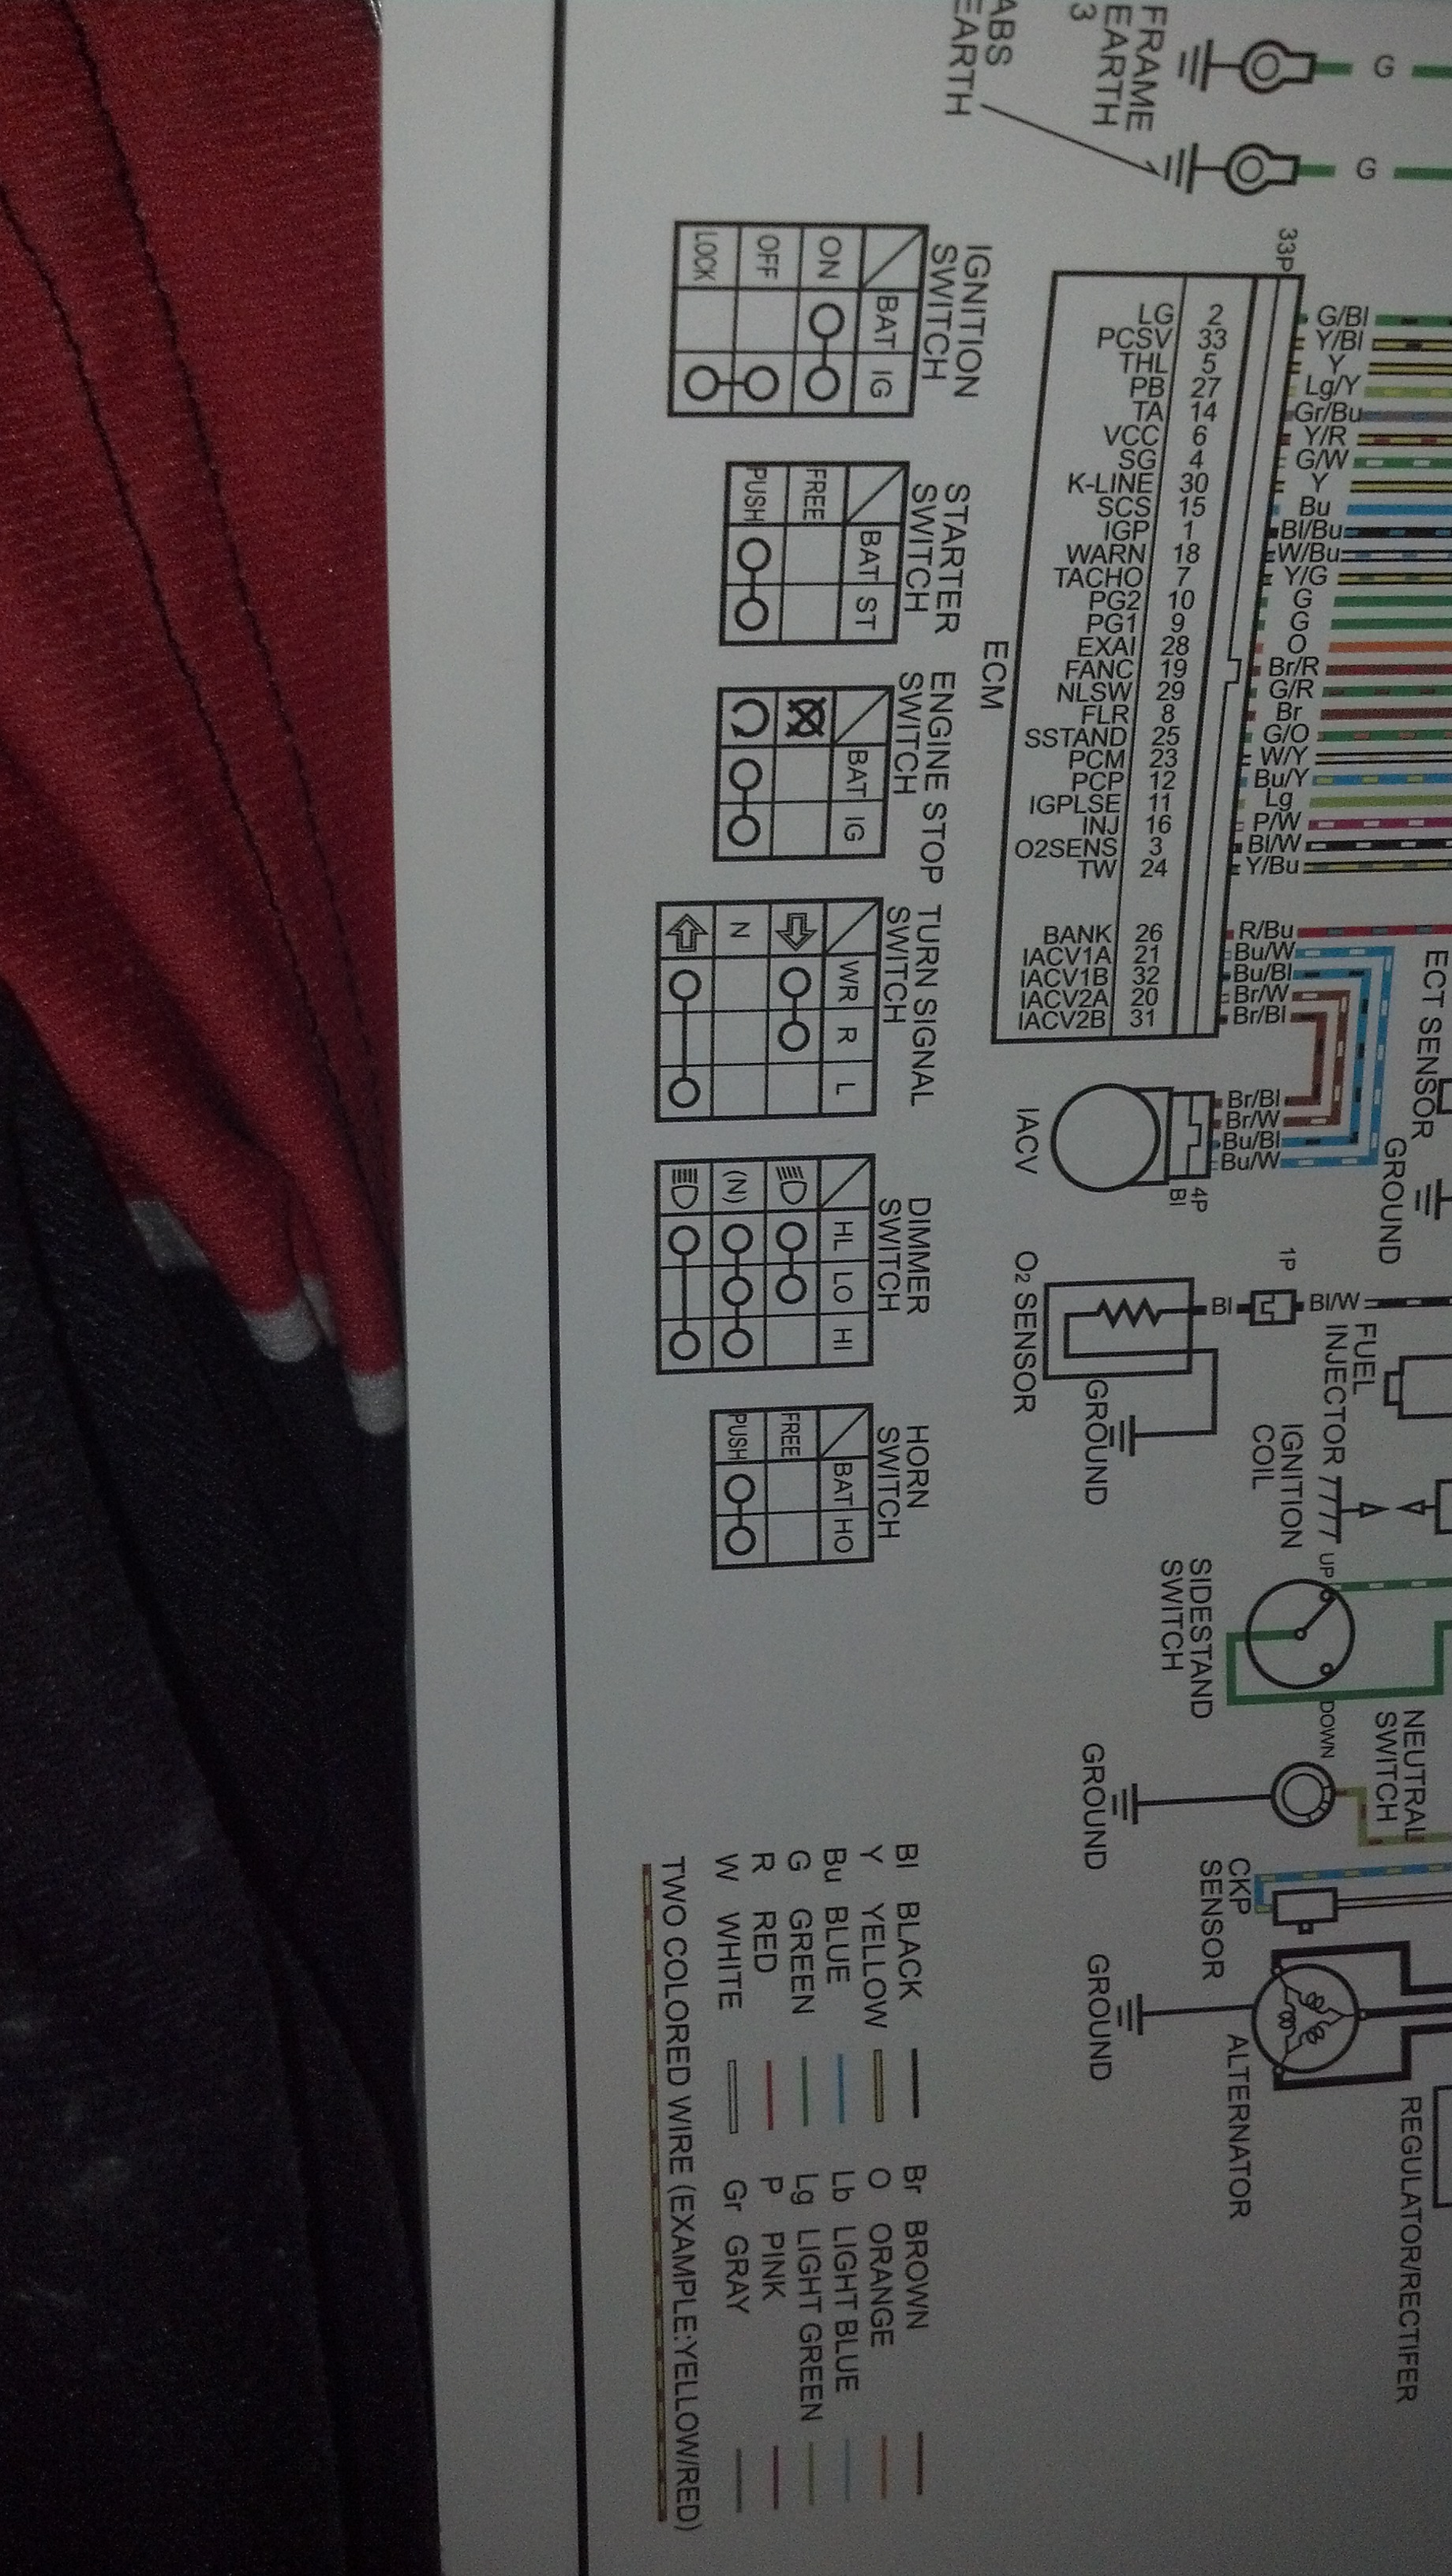 Build Msx250r Cbr Swap 2012 Honda Cbr250ra Wiring Diagram 09 20 19 44 56 329